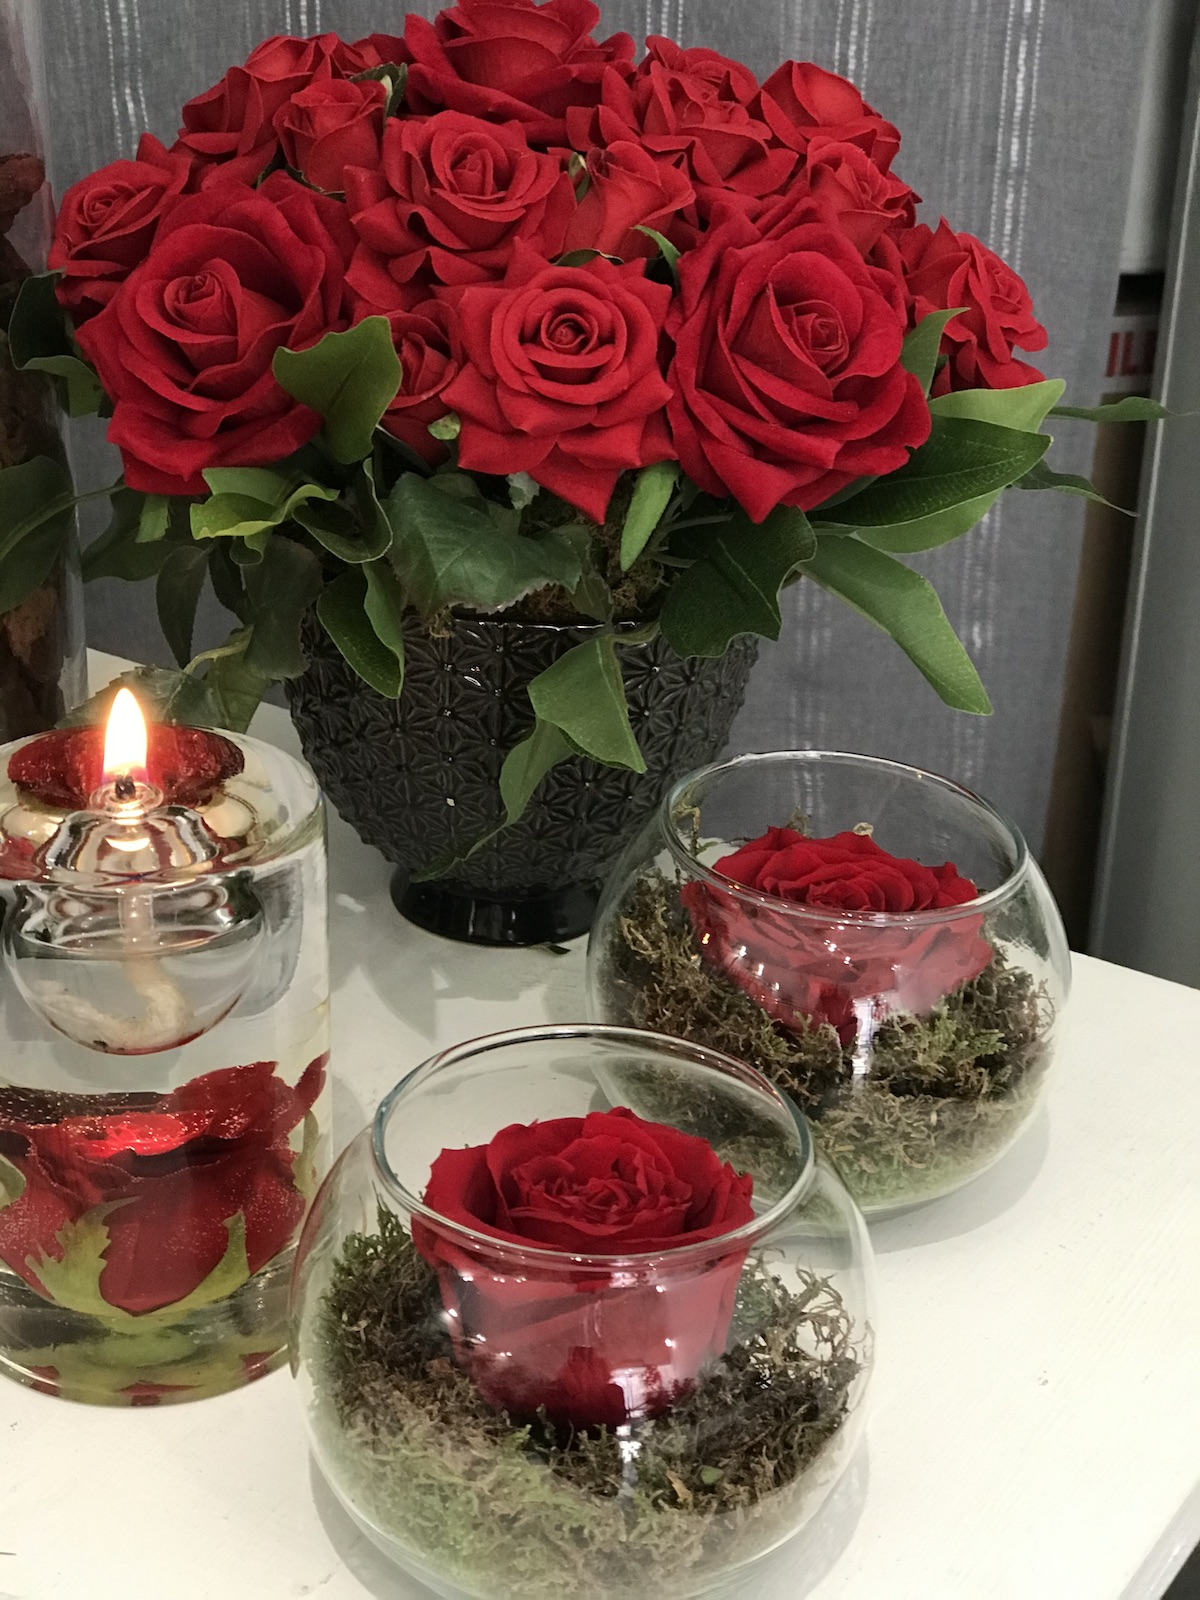 Rose stabilizzate deco fleurs roma prati